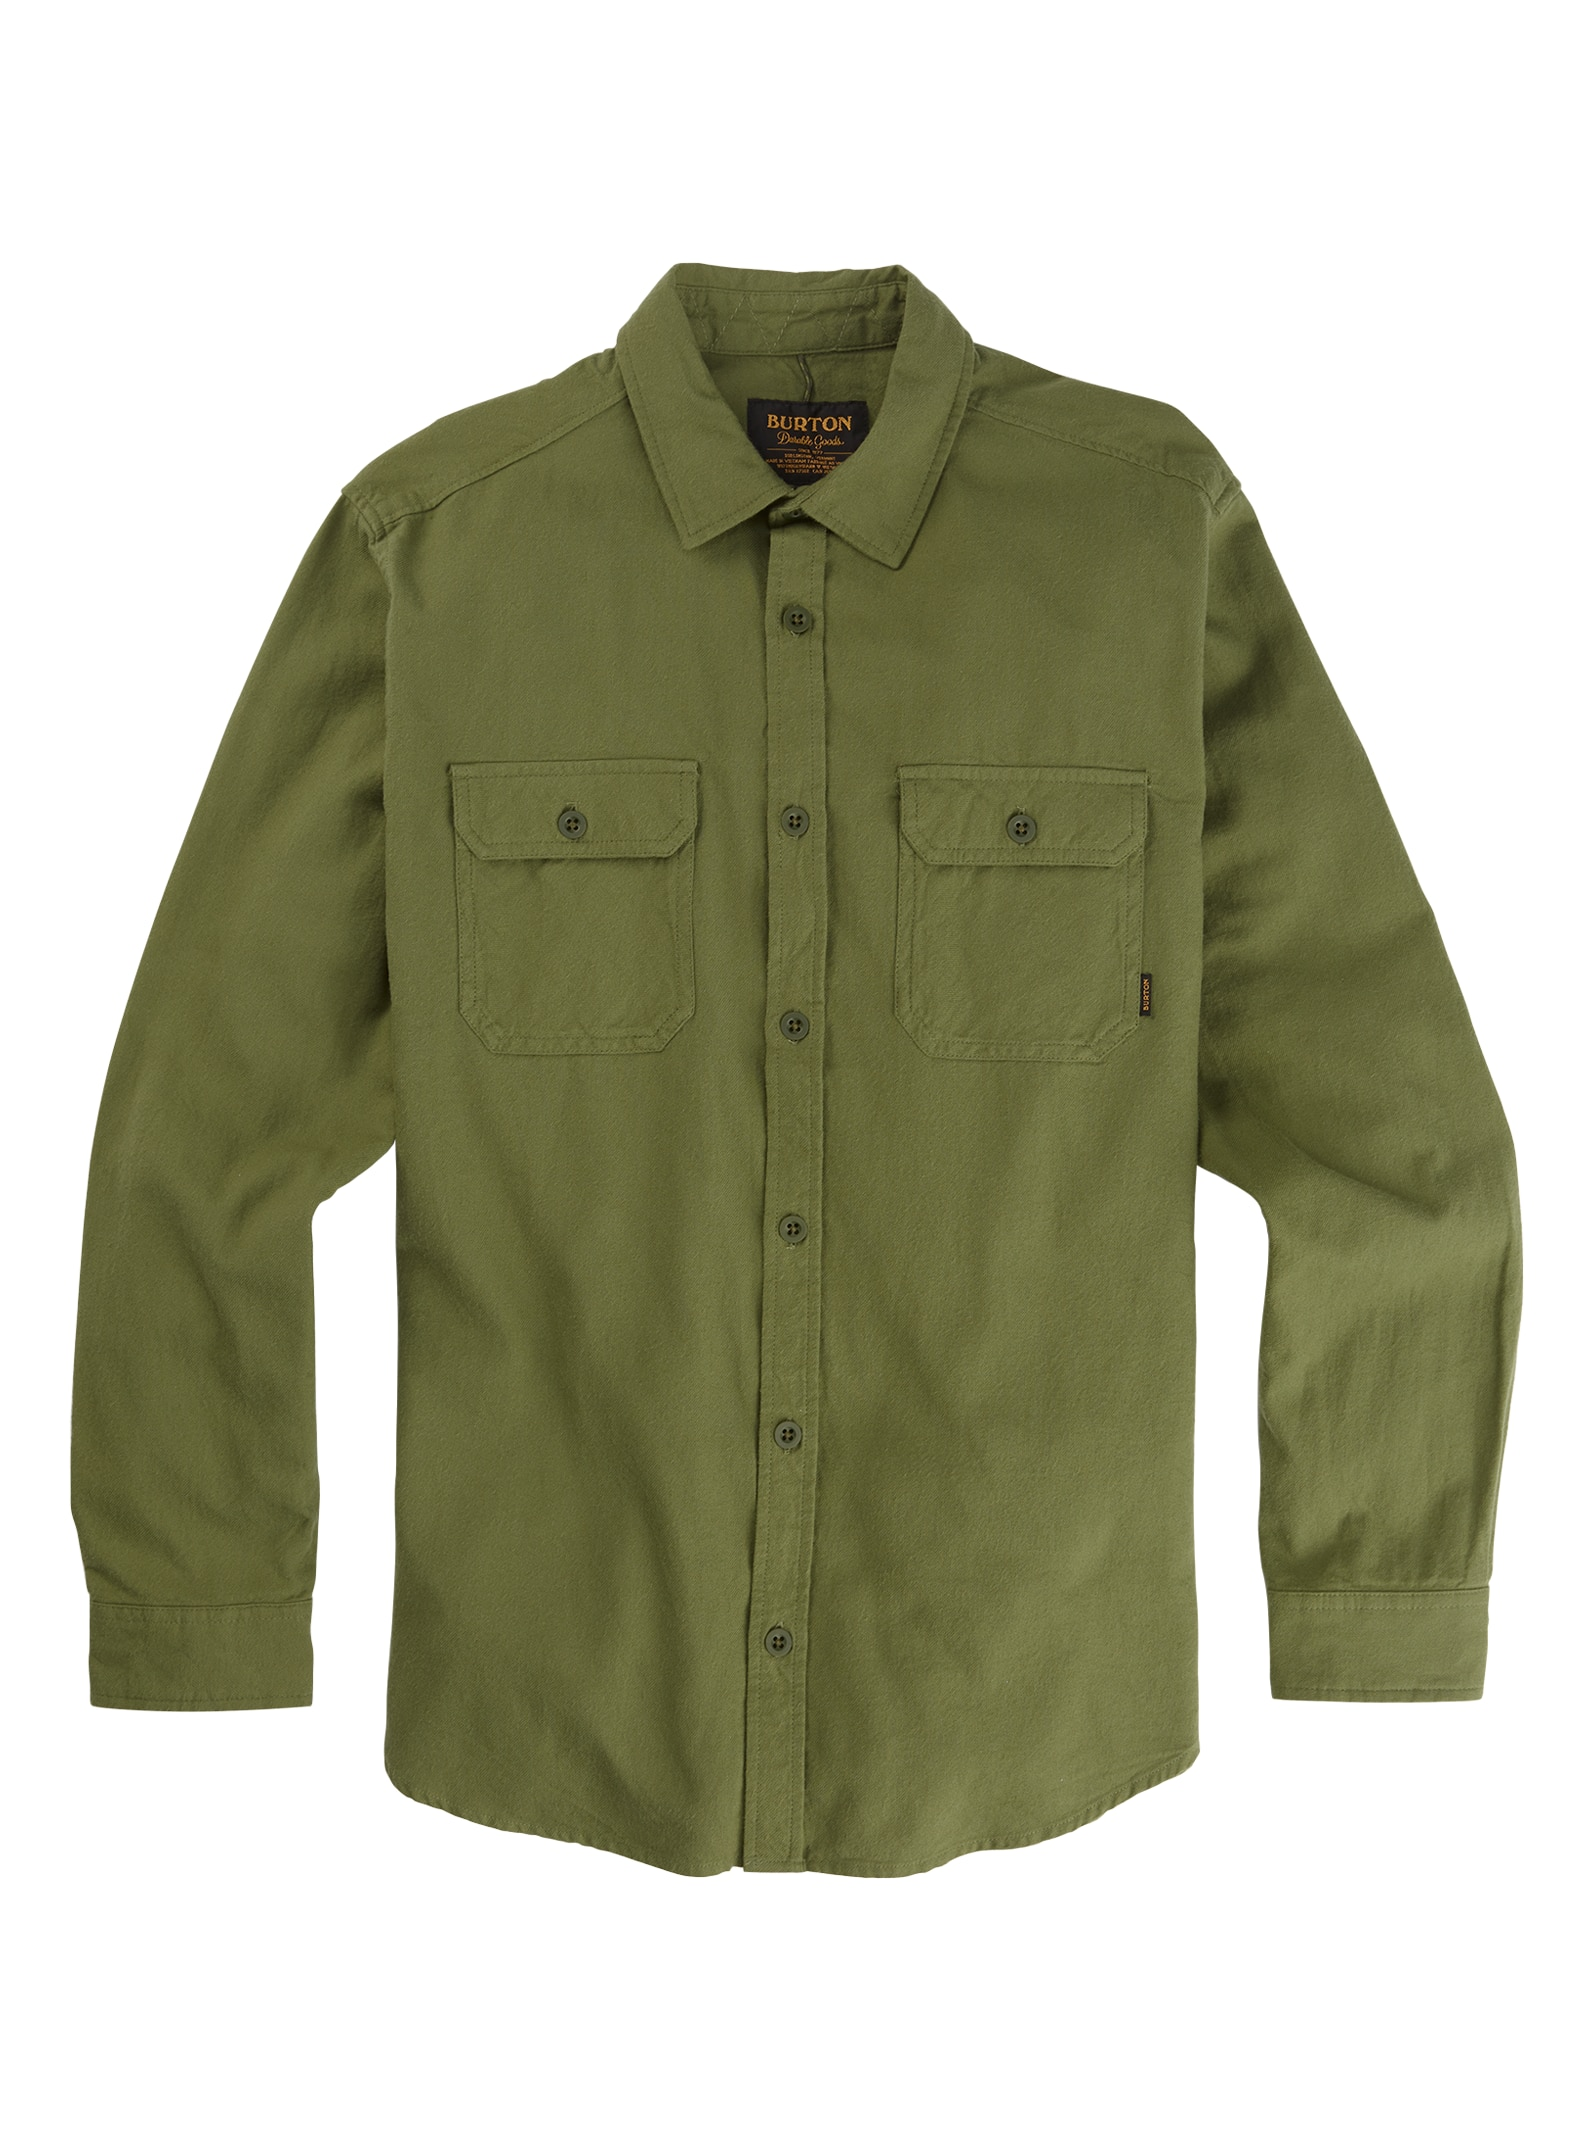 a8ad84fed22e Sale Clothing   Gear